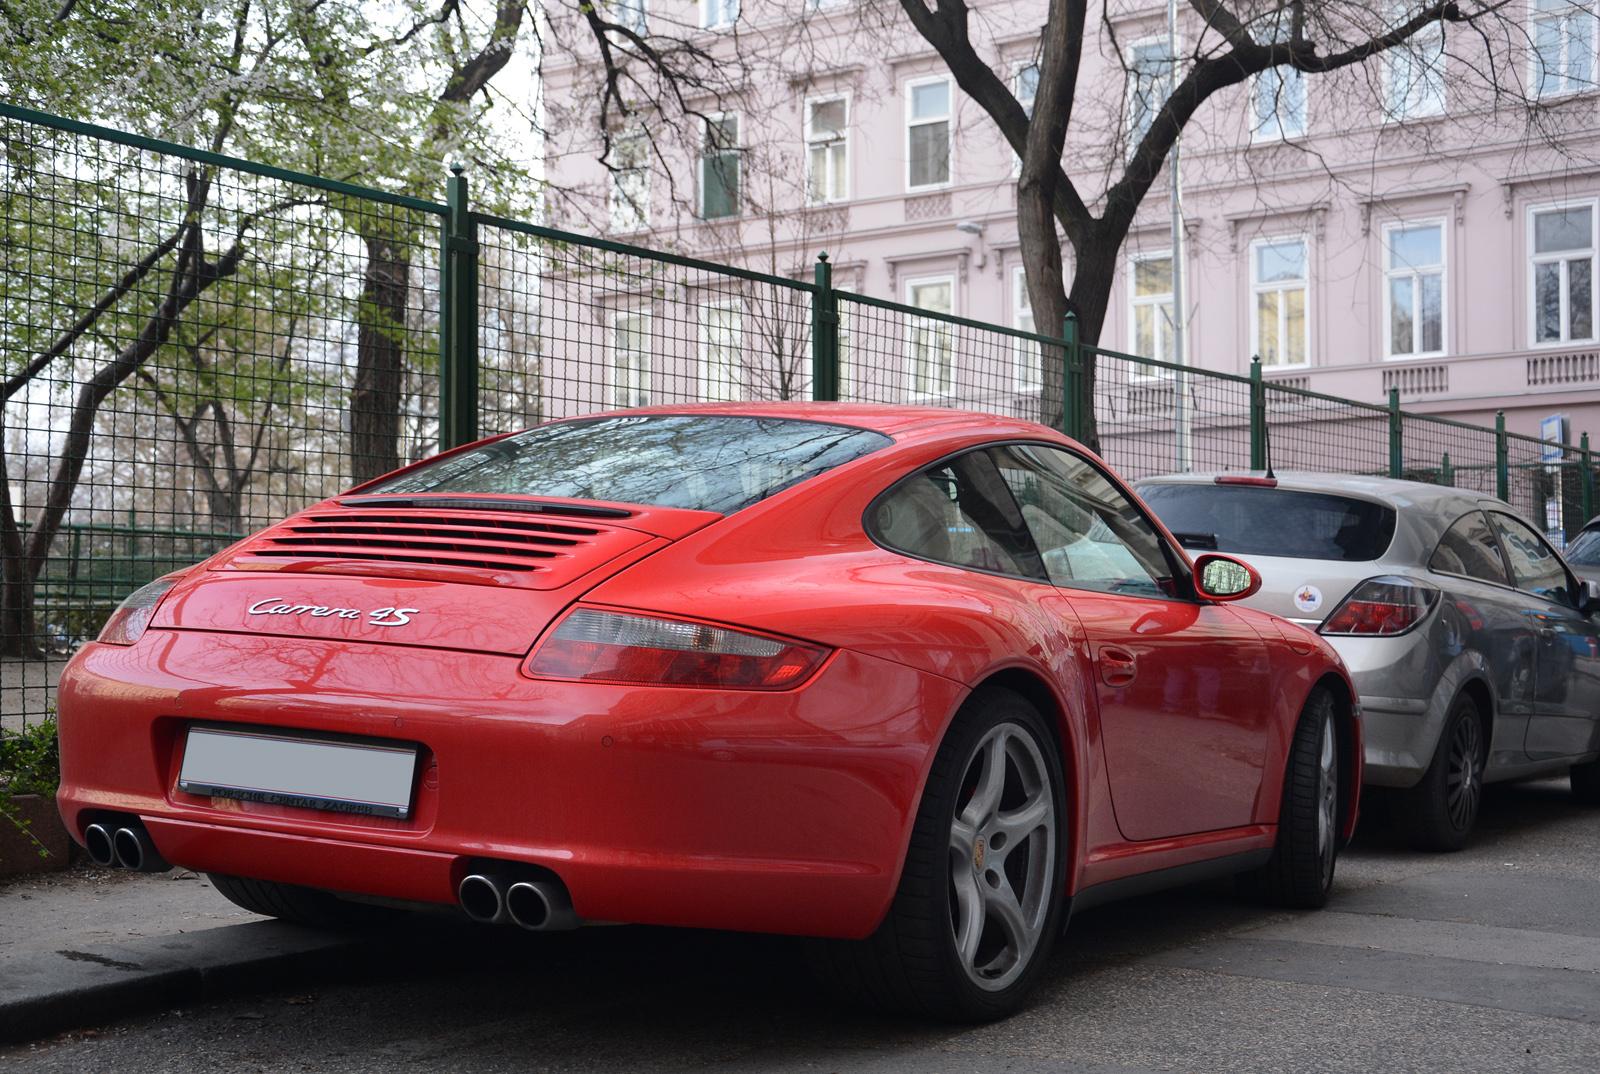 Porsche 911 (997) Carrera 4S